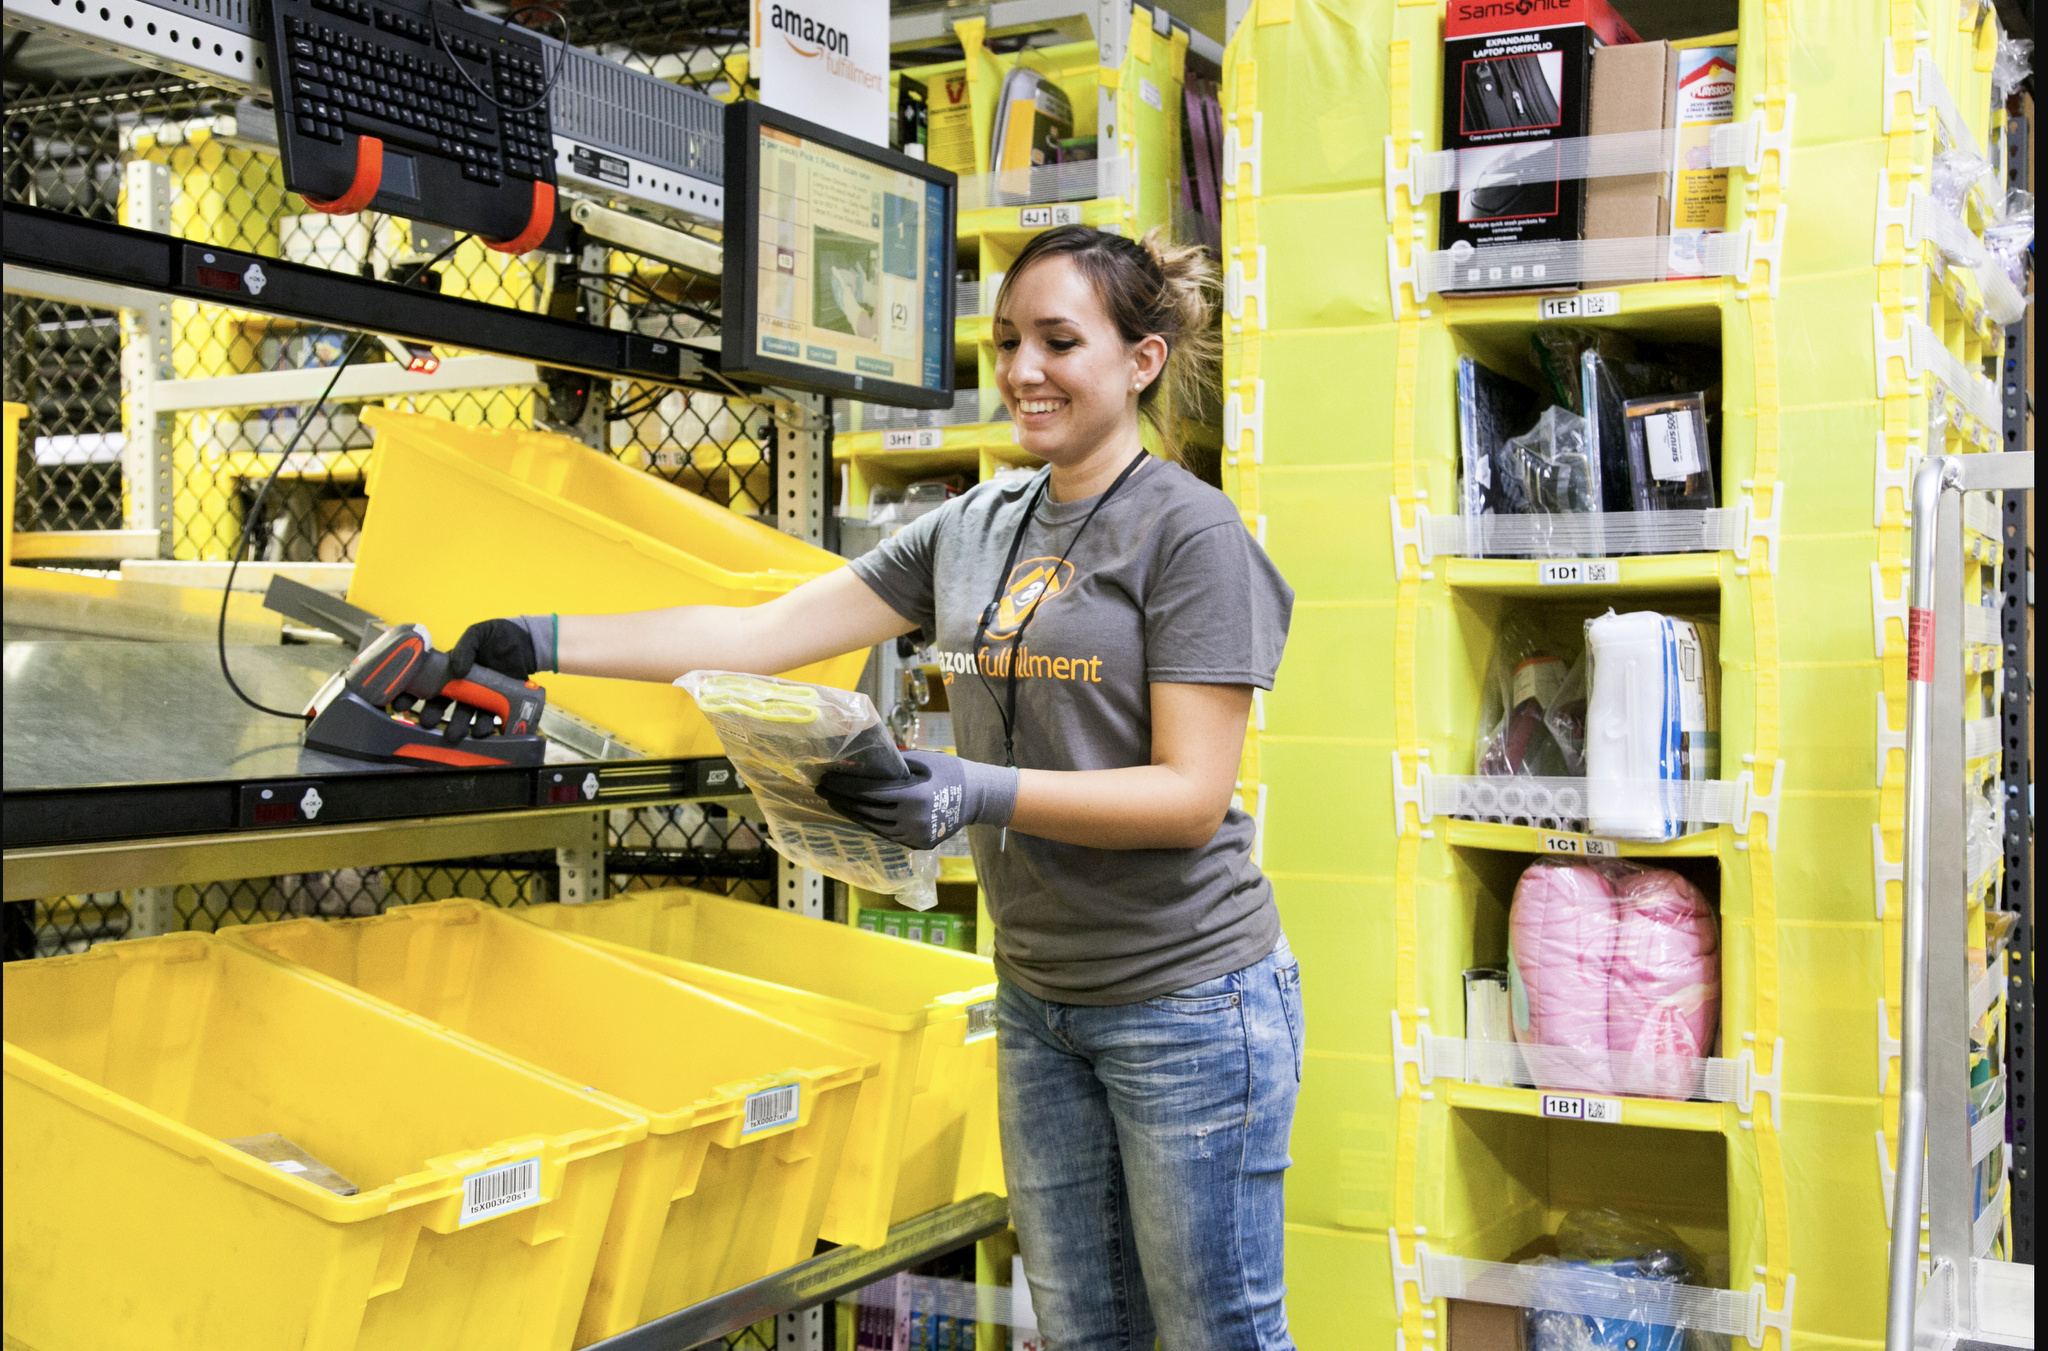 An employee picking at an Amazon fulfillment center.